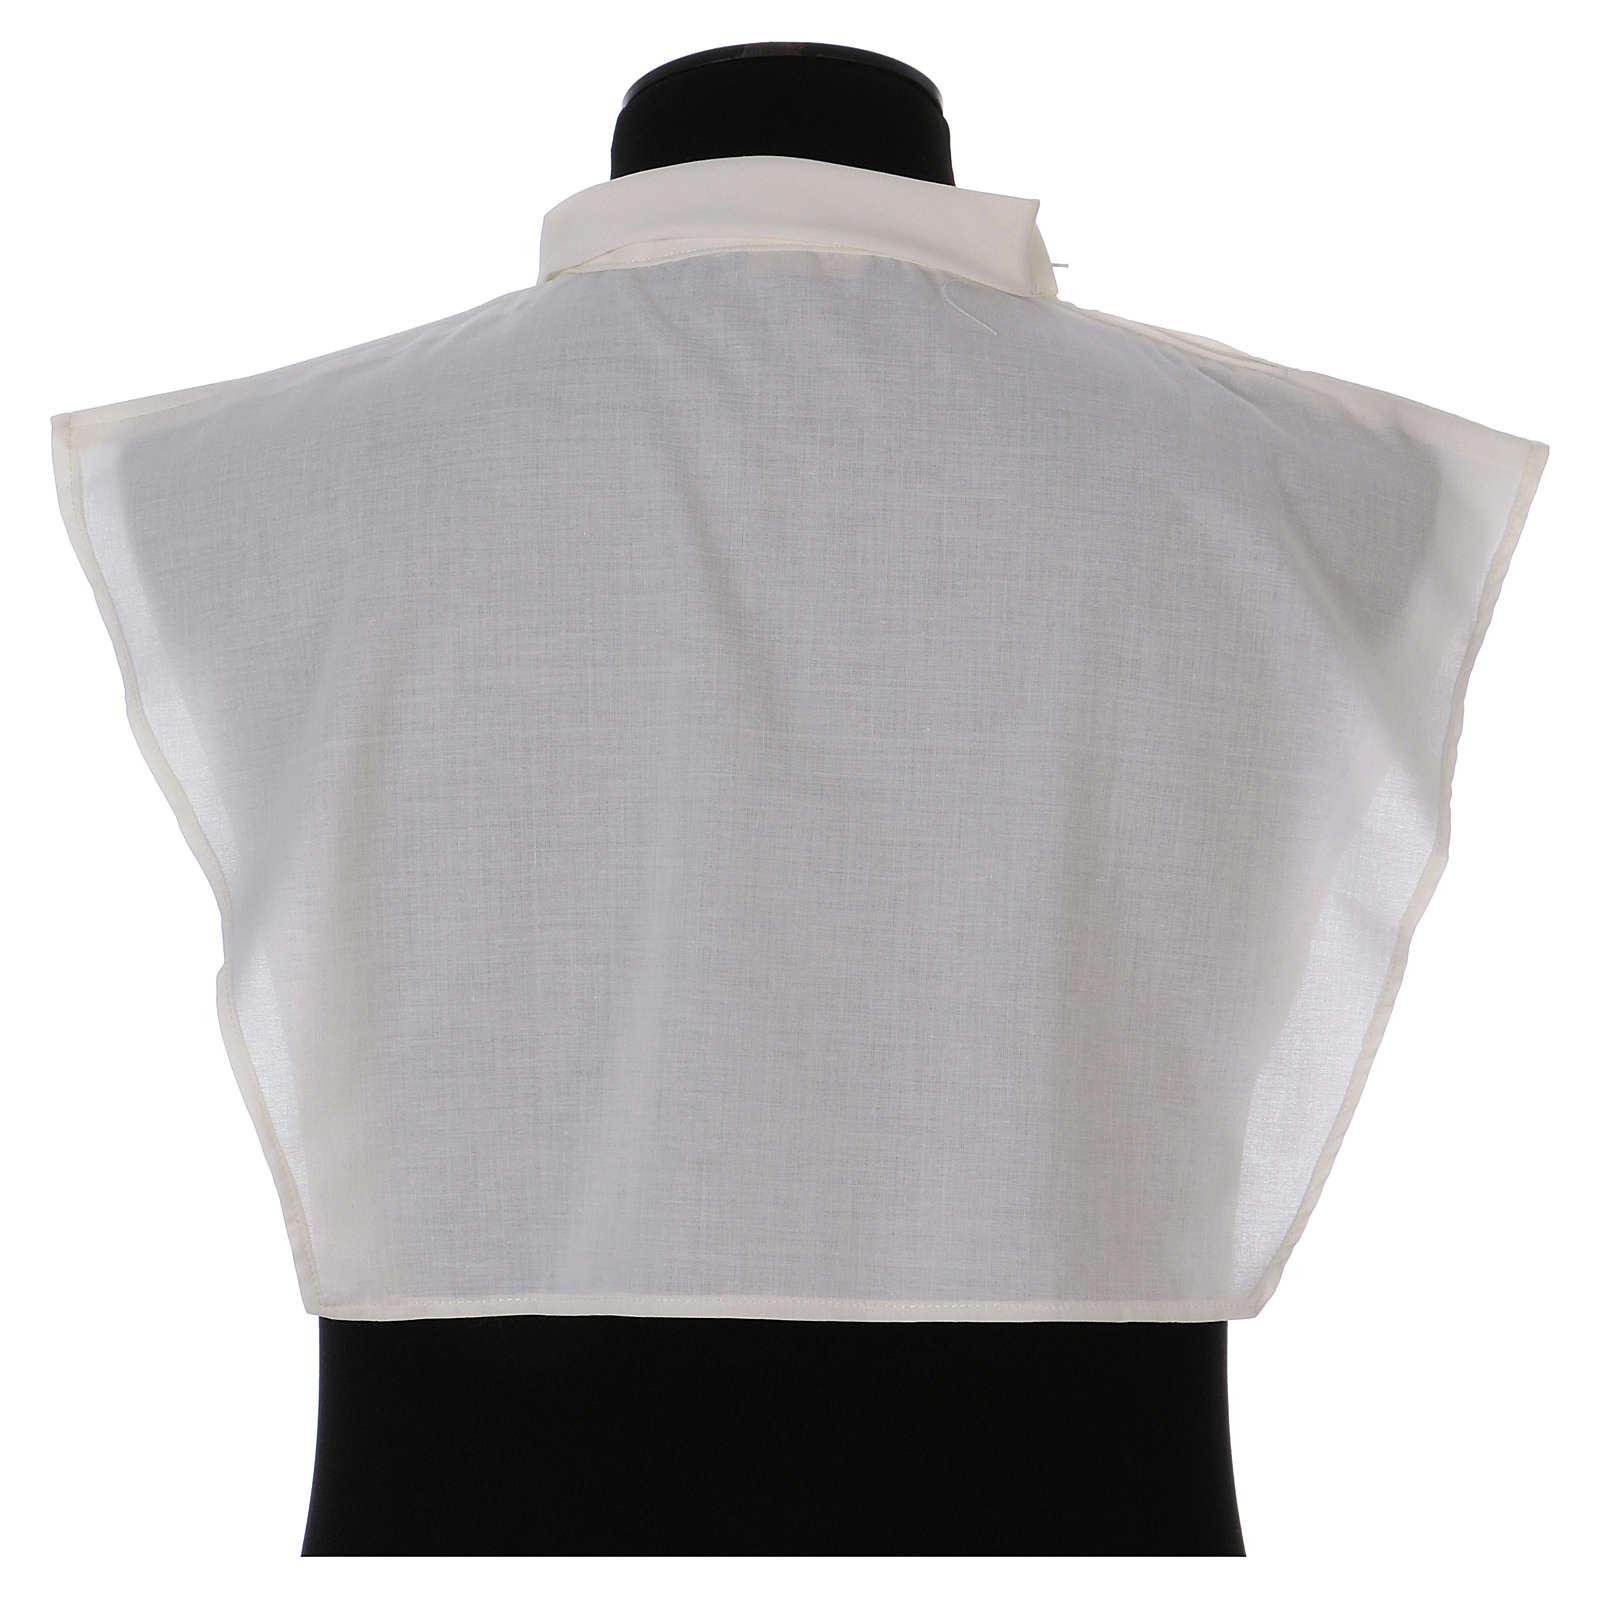 Amito marfil 55% poliéster 45% algodón cremallera hombro 4